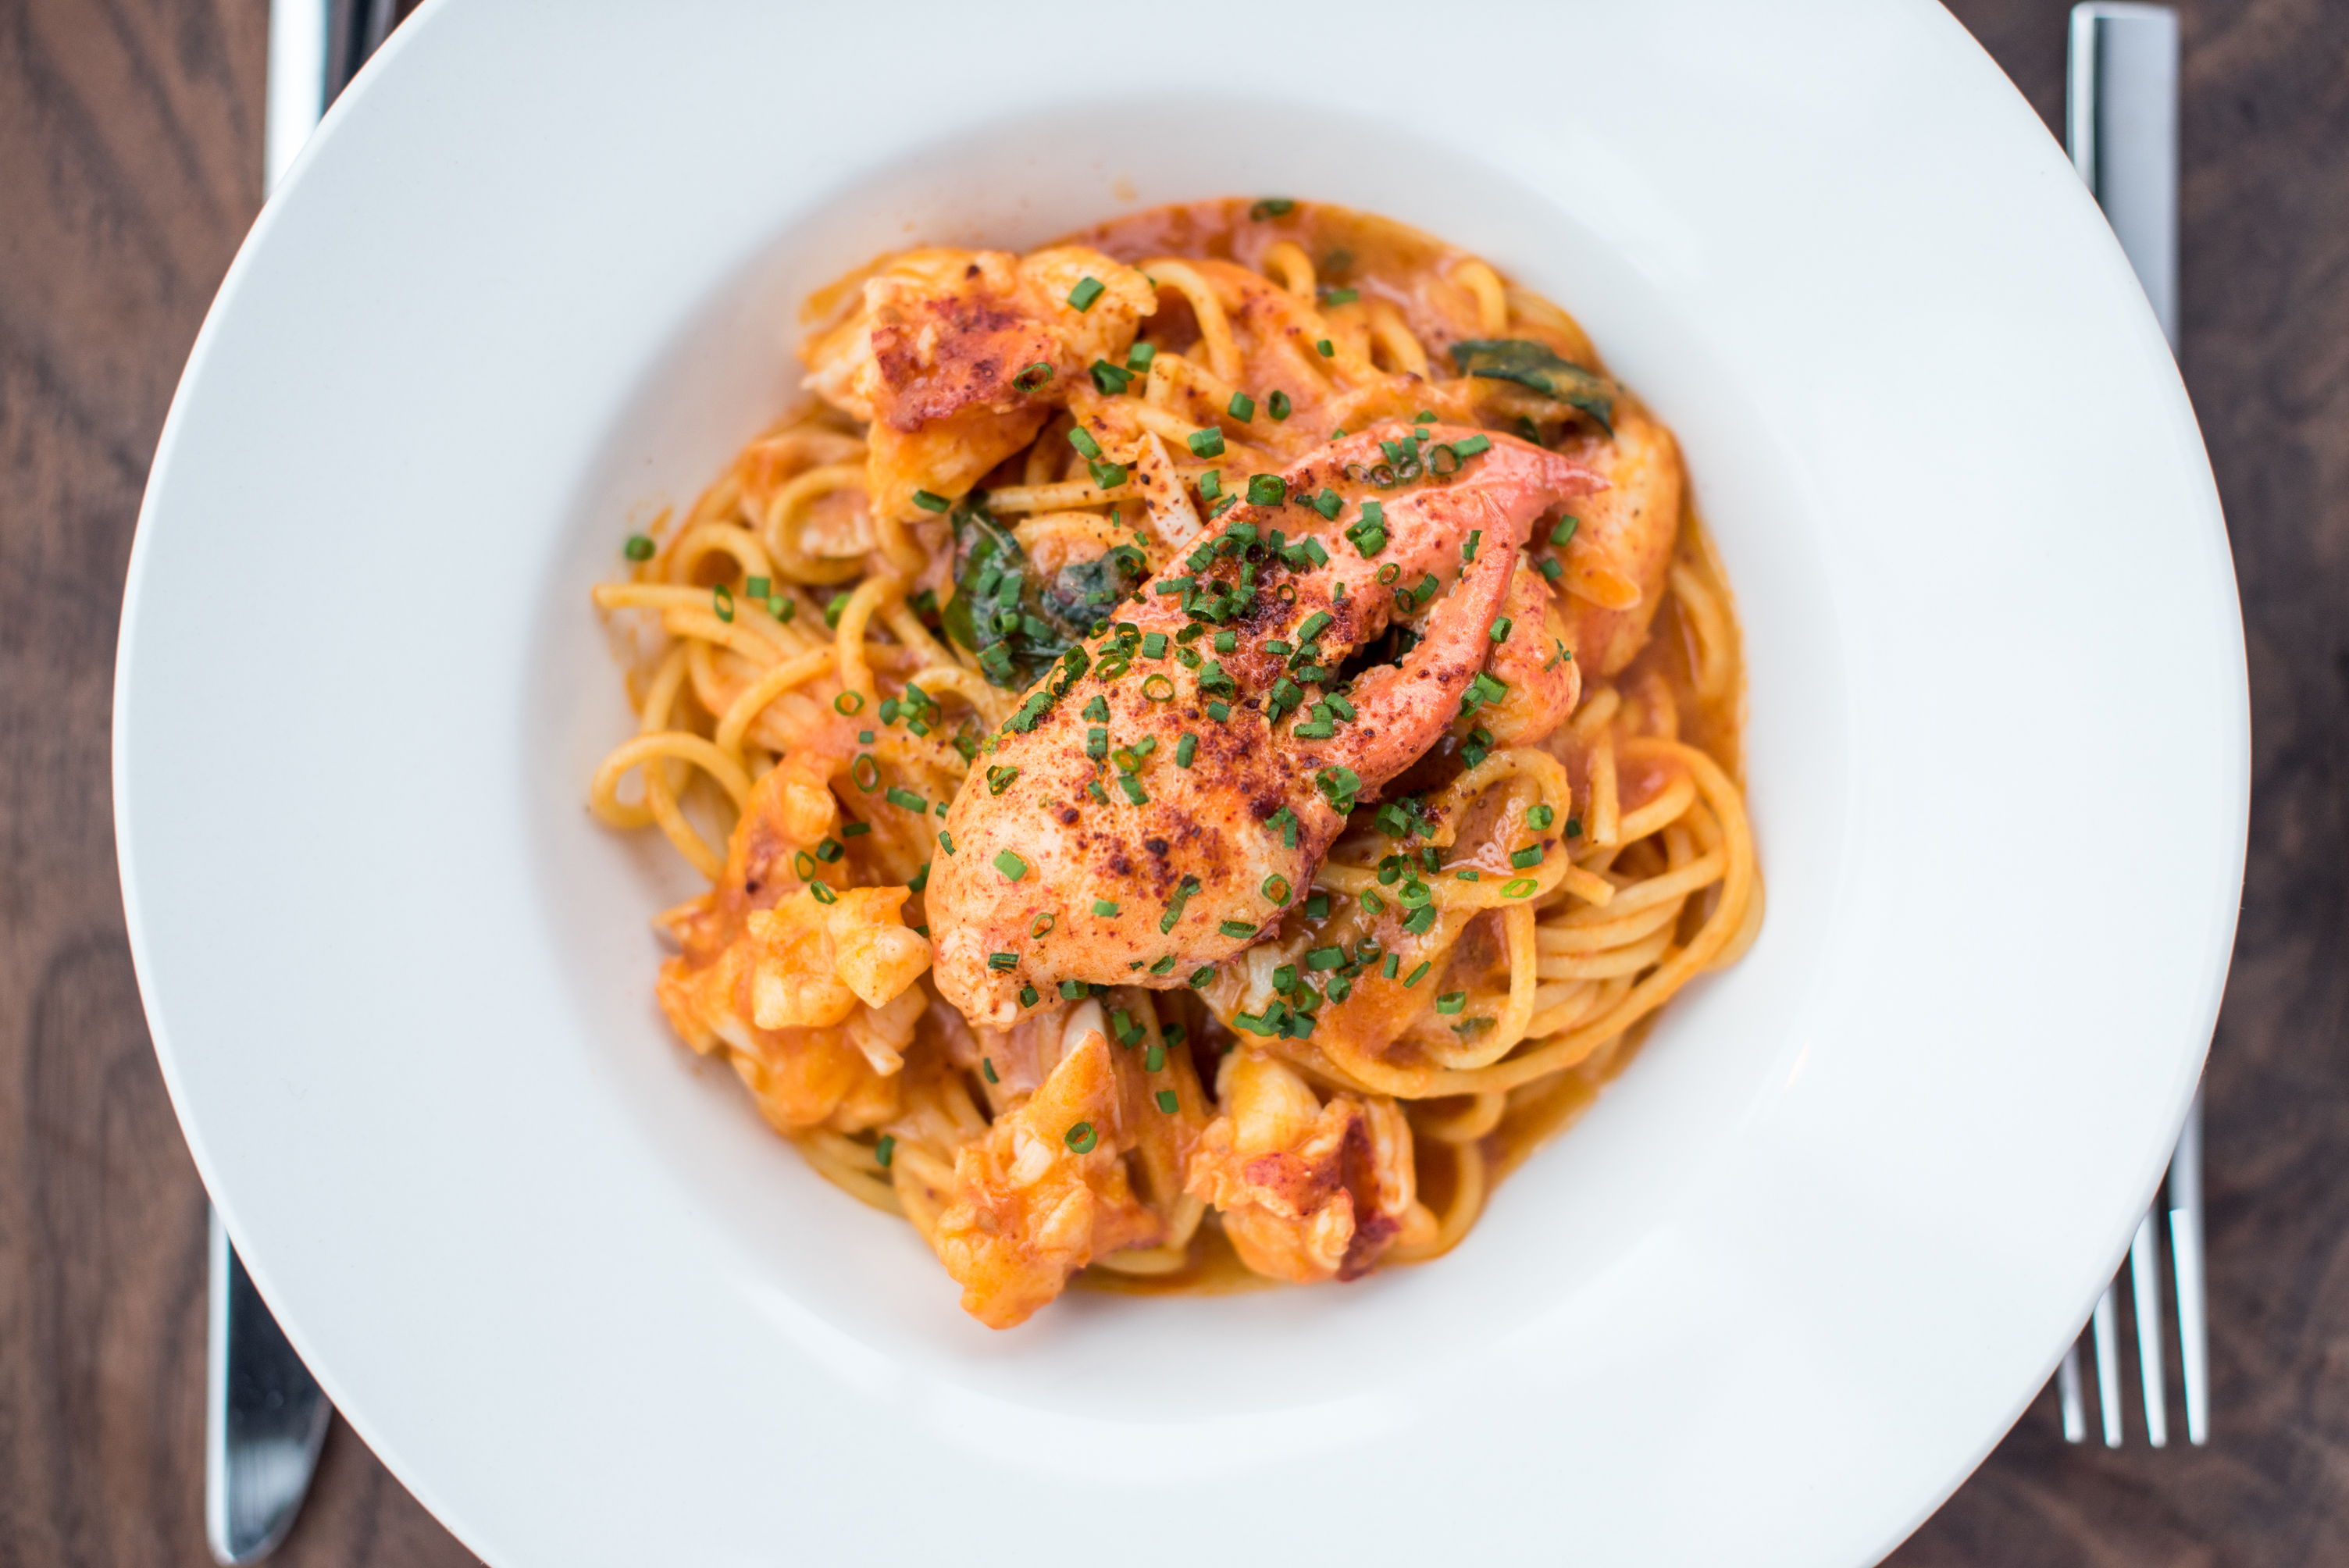 Lobster spaghetti at Martina